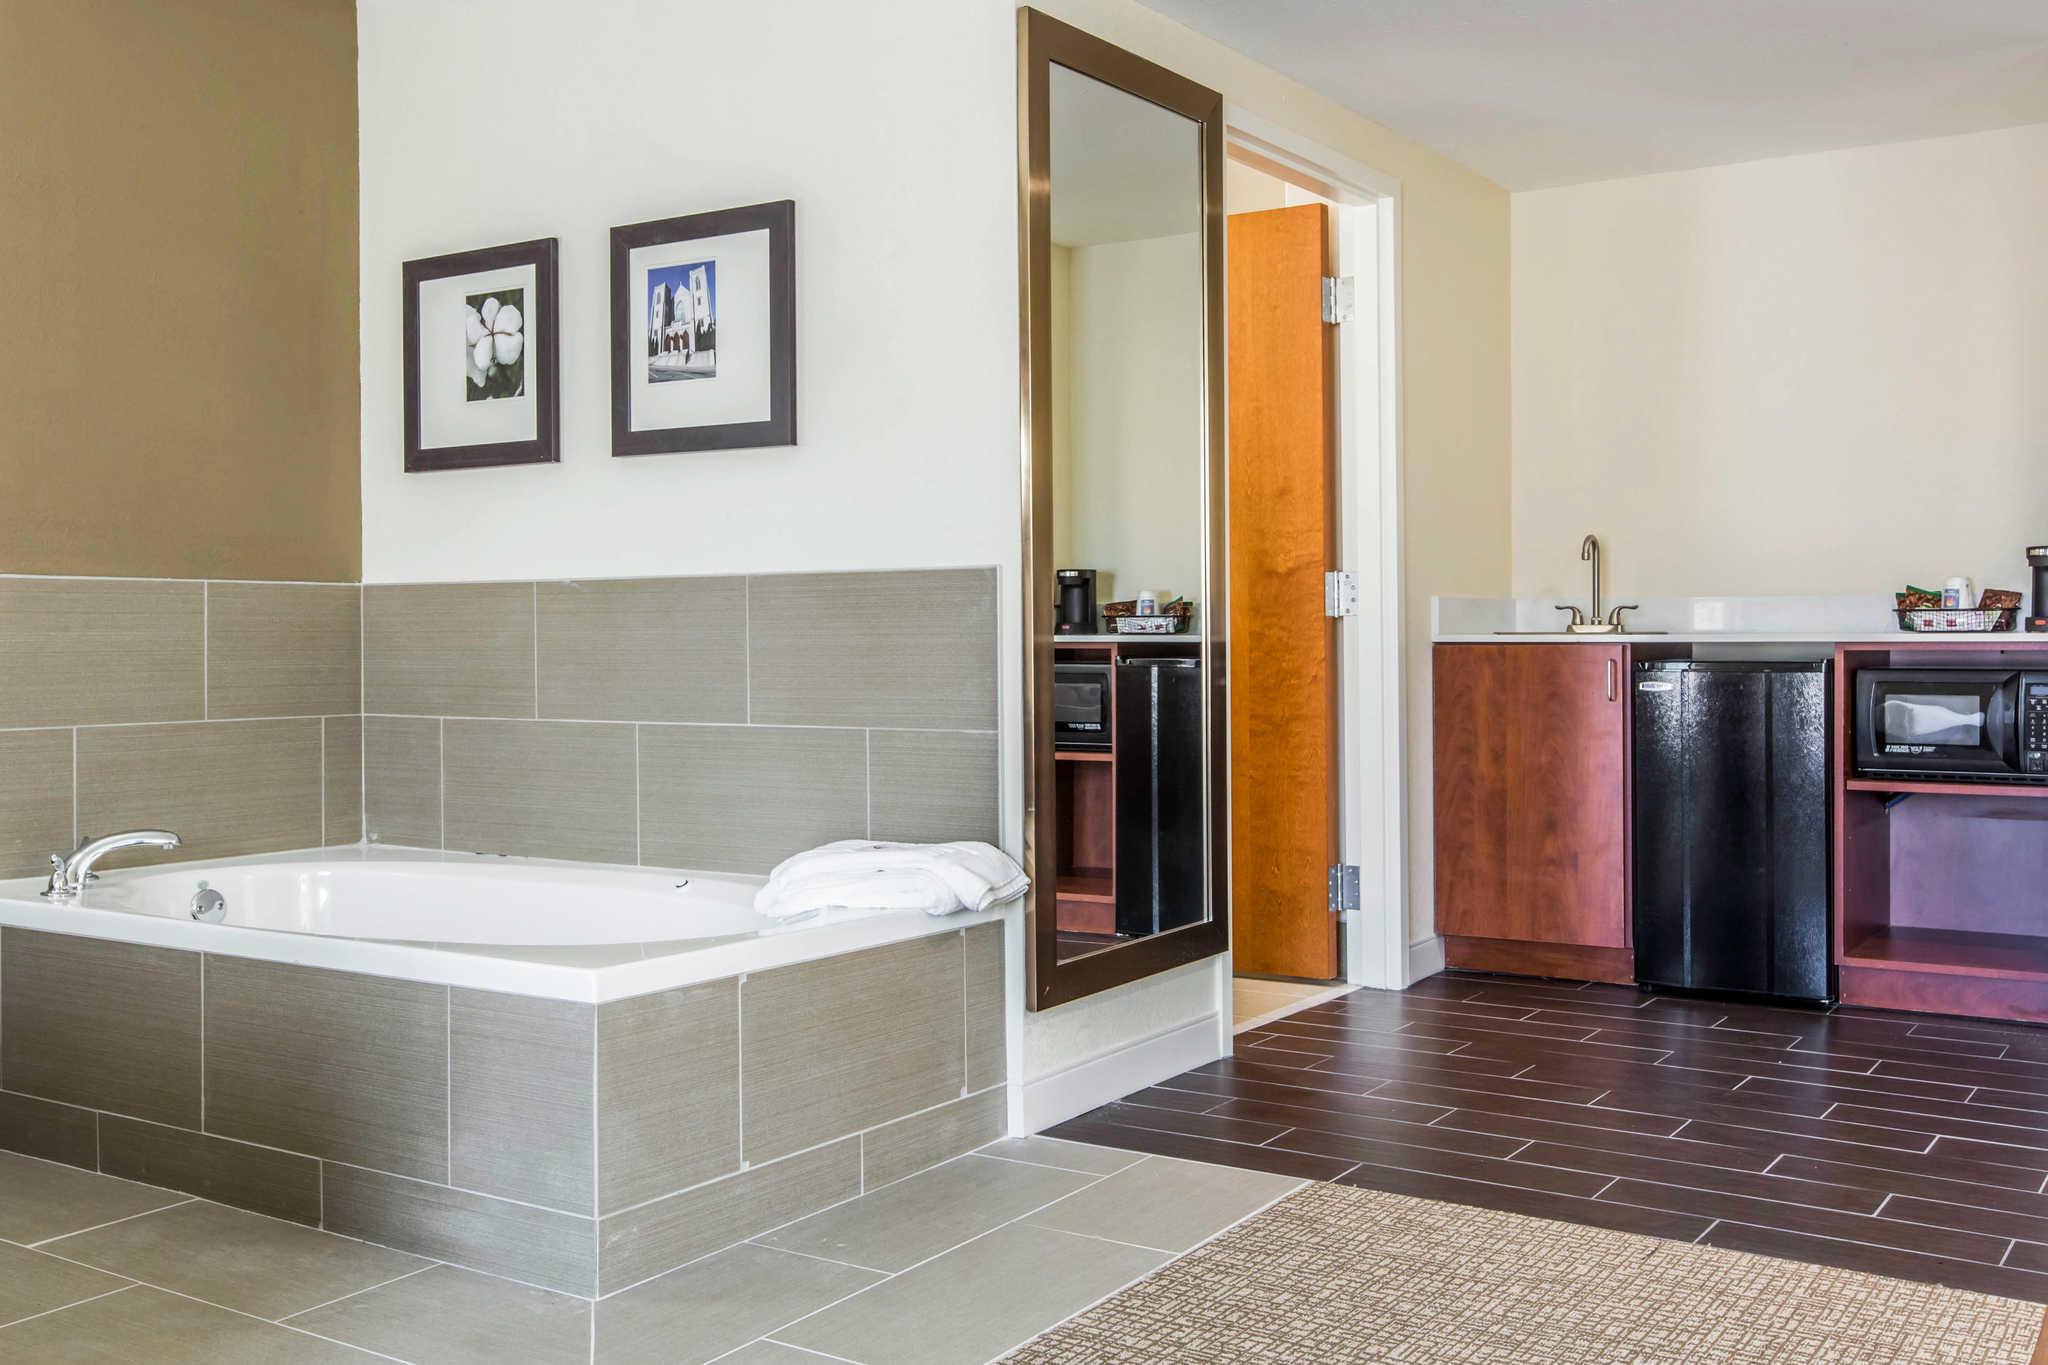 Comfort Inn & Suites West image 14